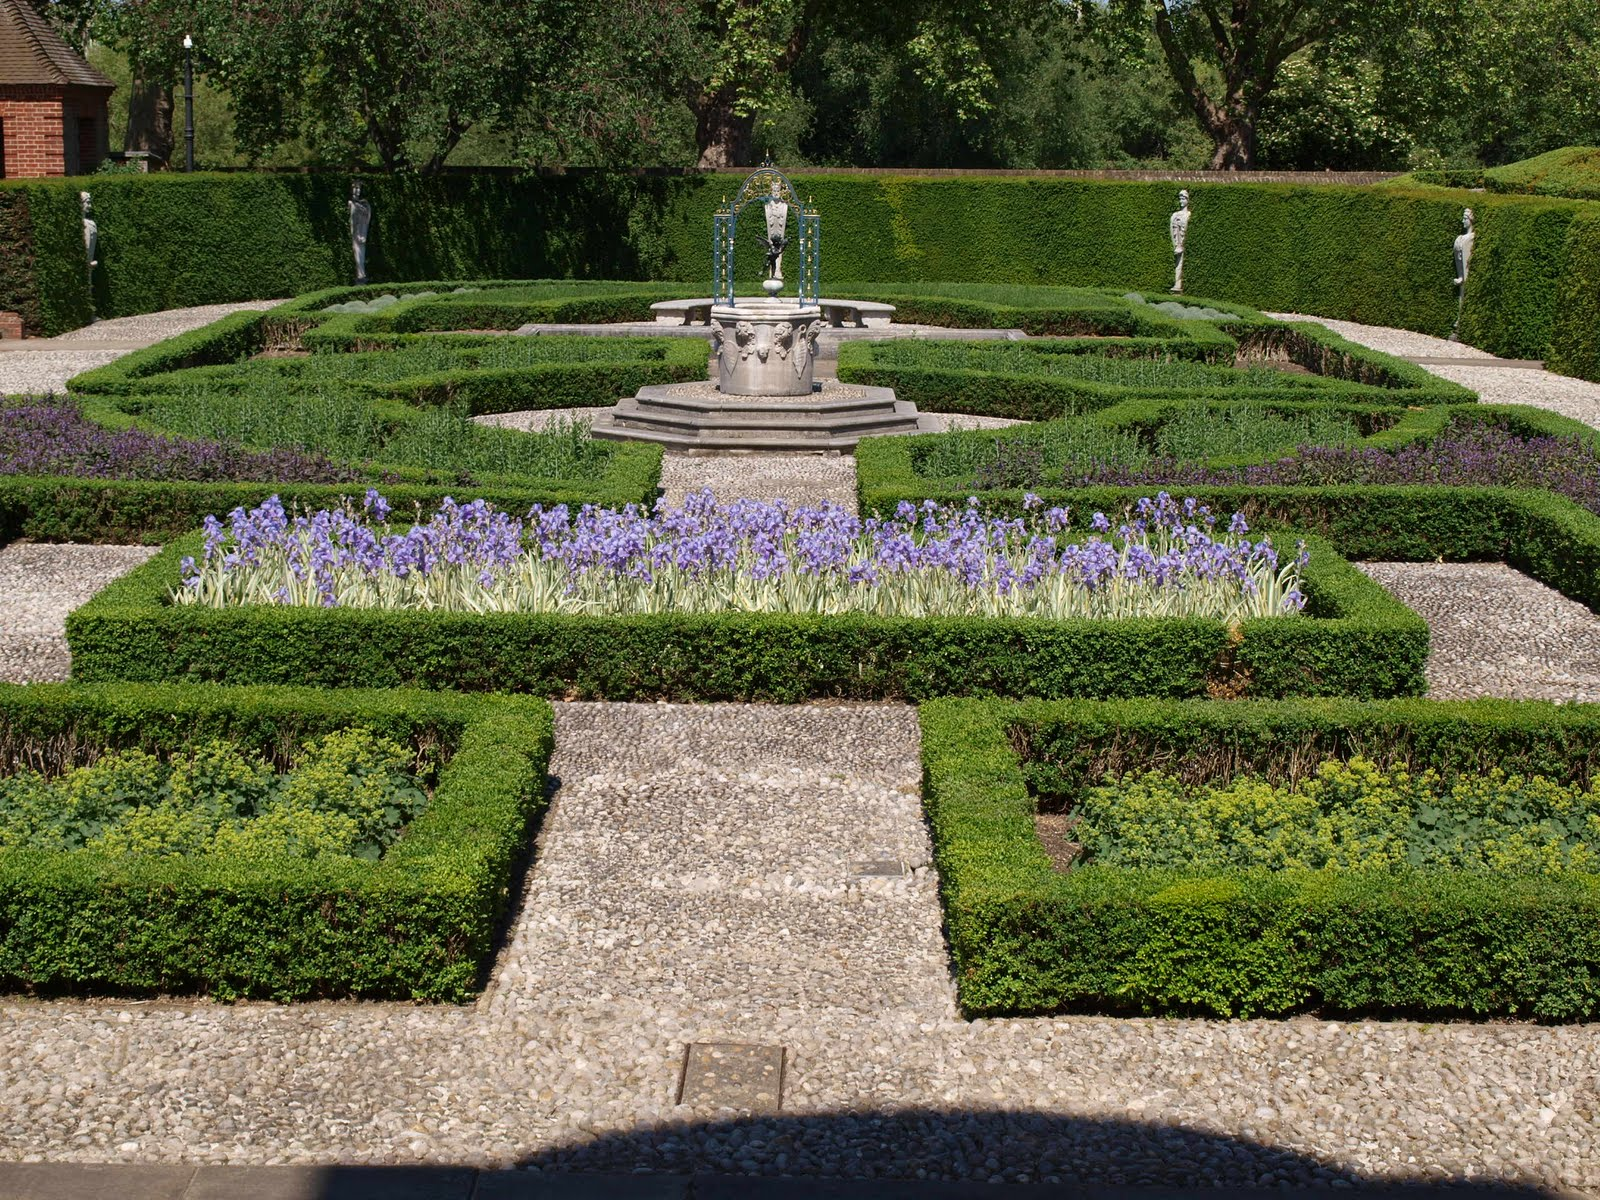 My Cottage Garden Kew Gardens London England